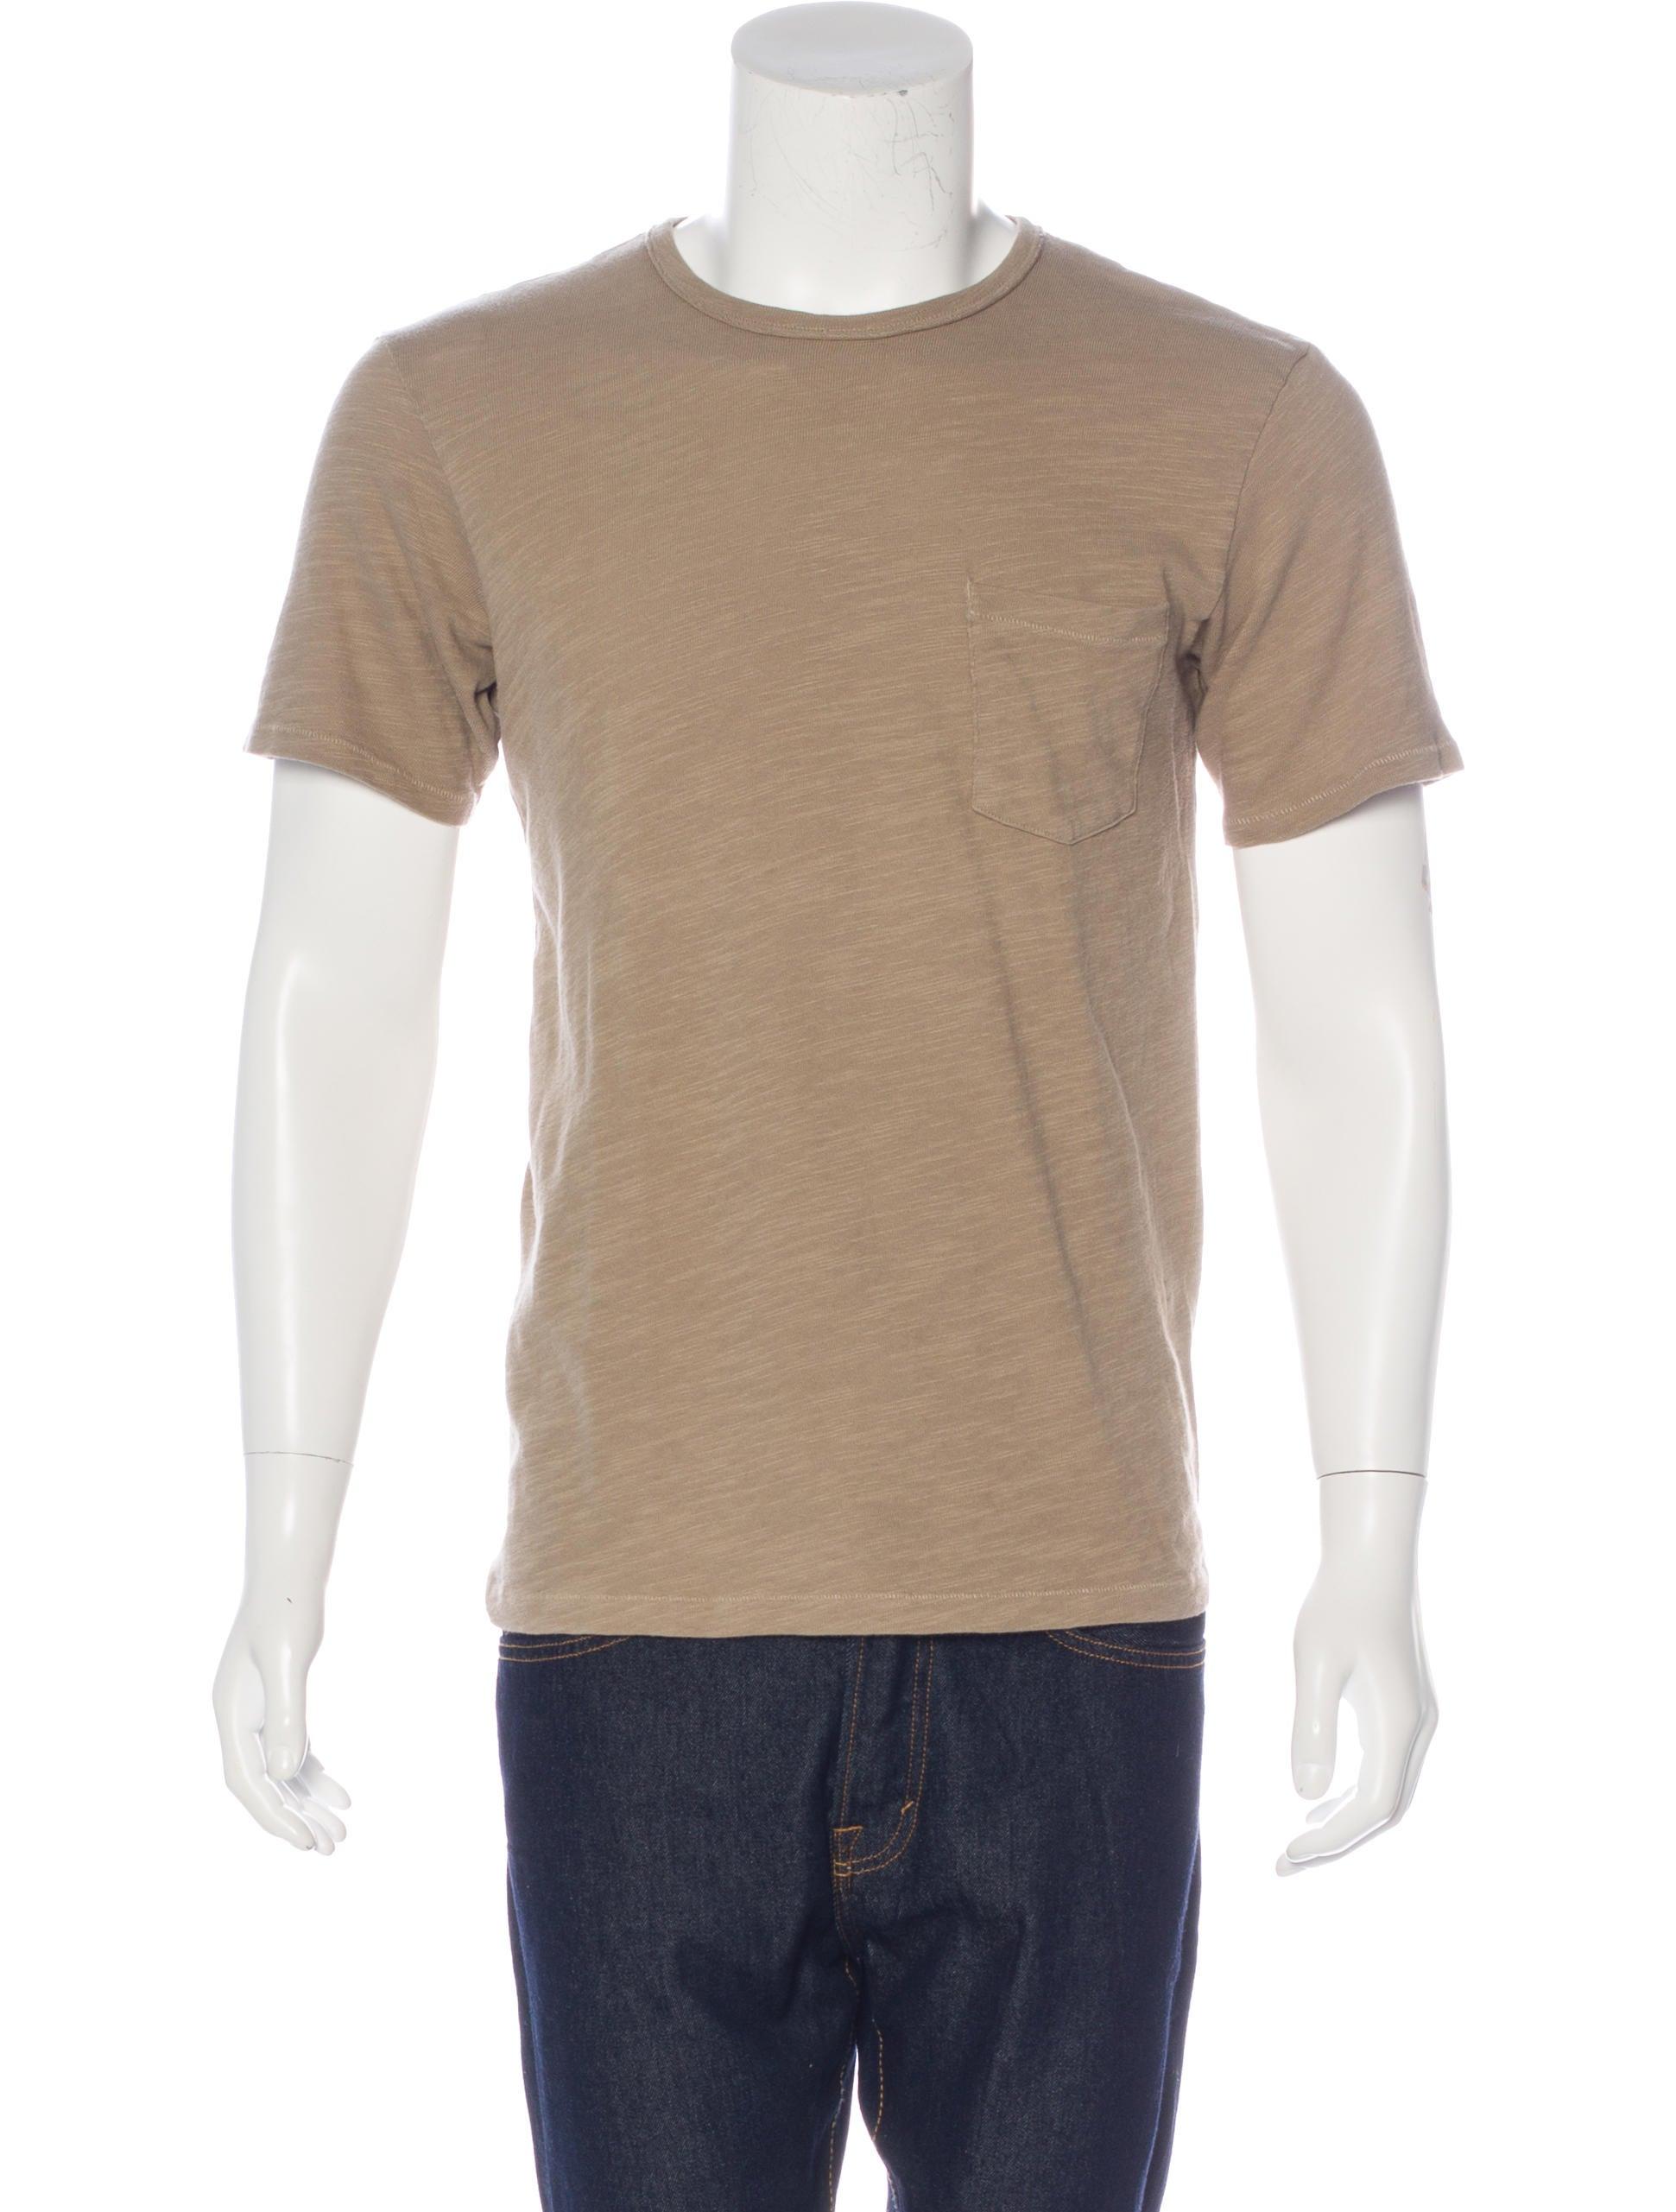 Rag Bone Crew Neck T Shirt Clothing Wragb74786 The